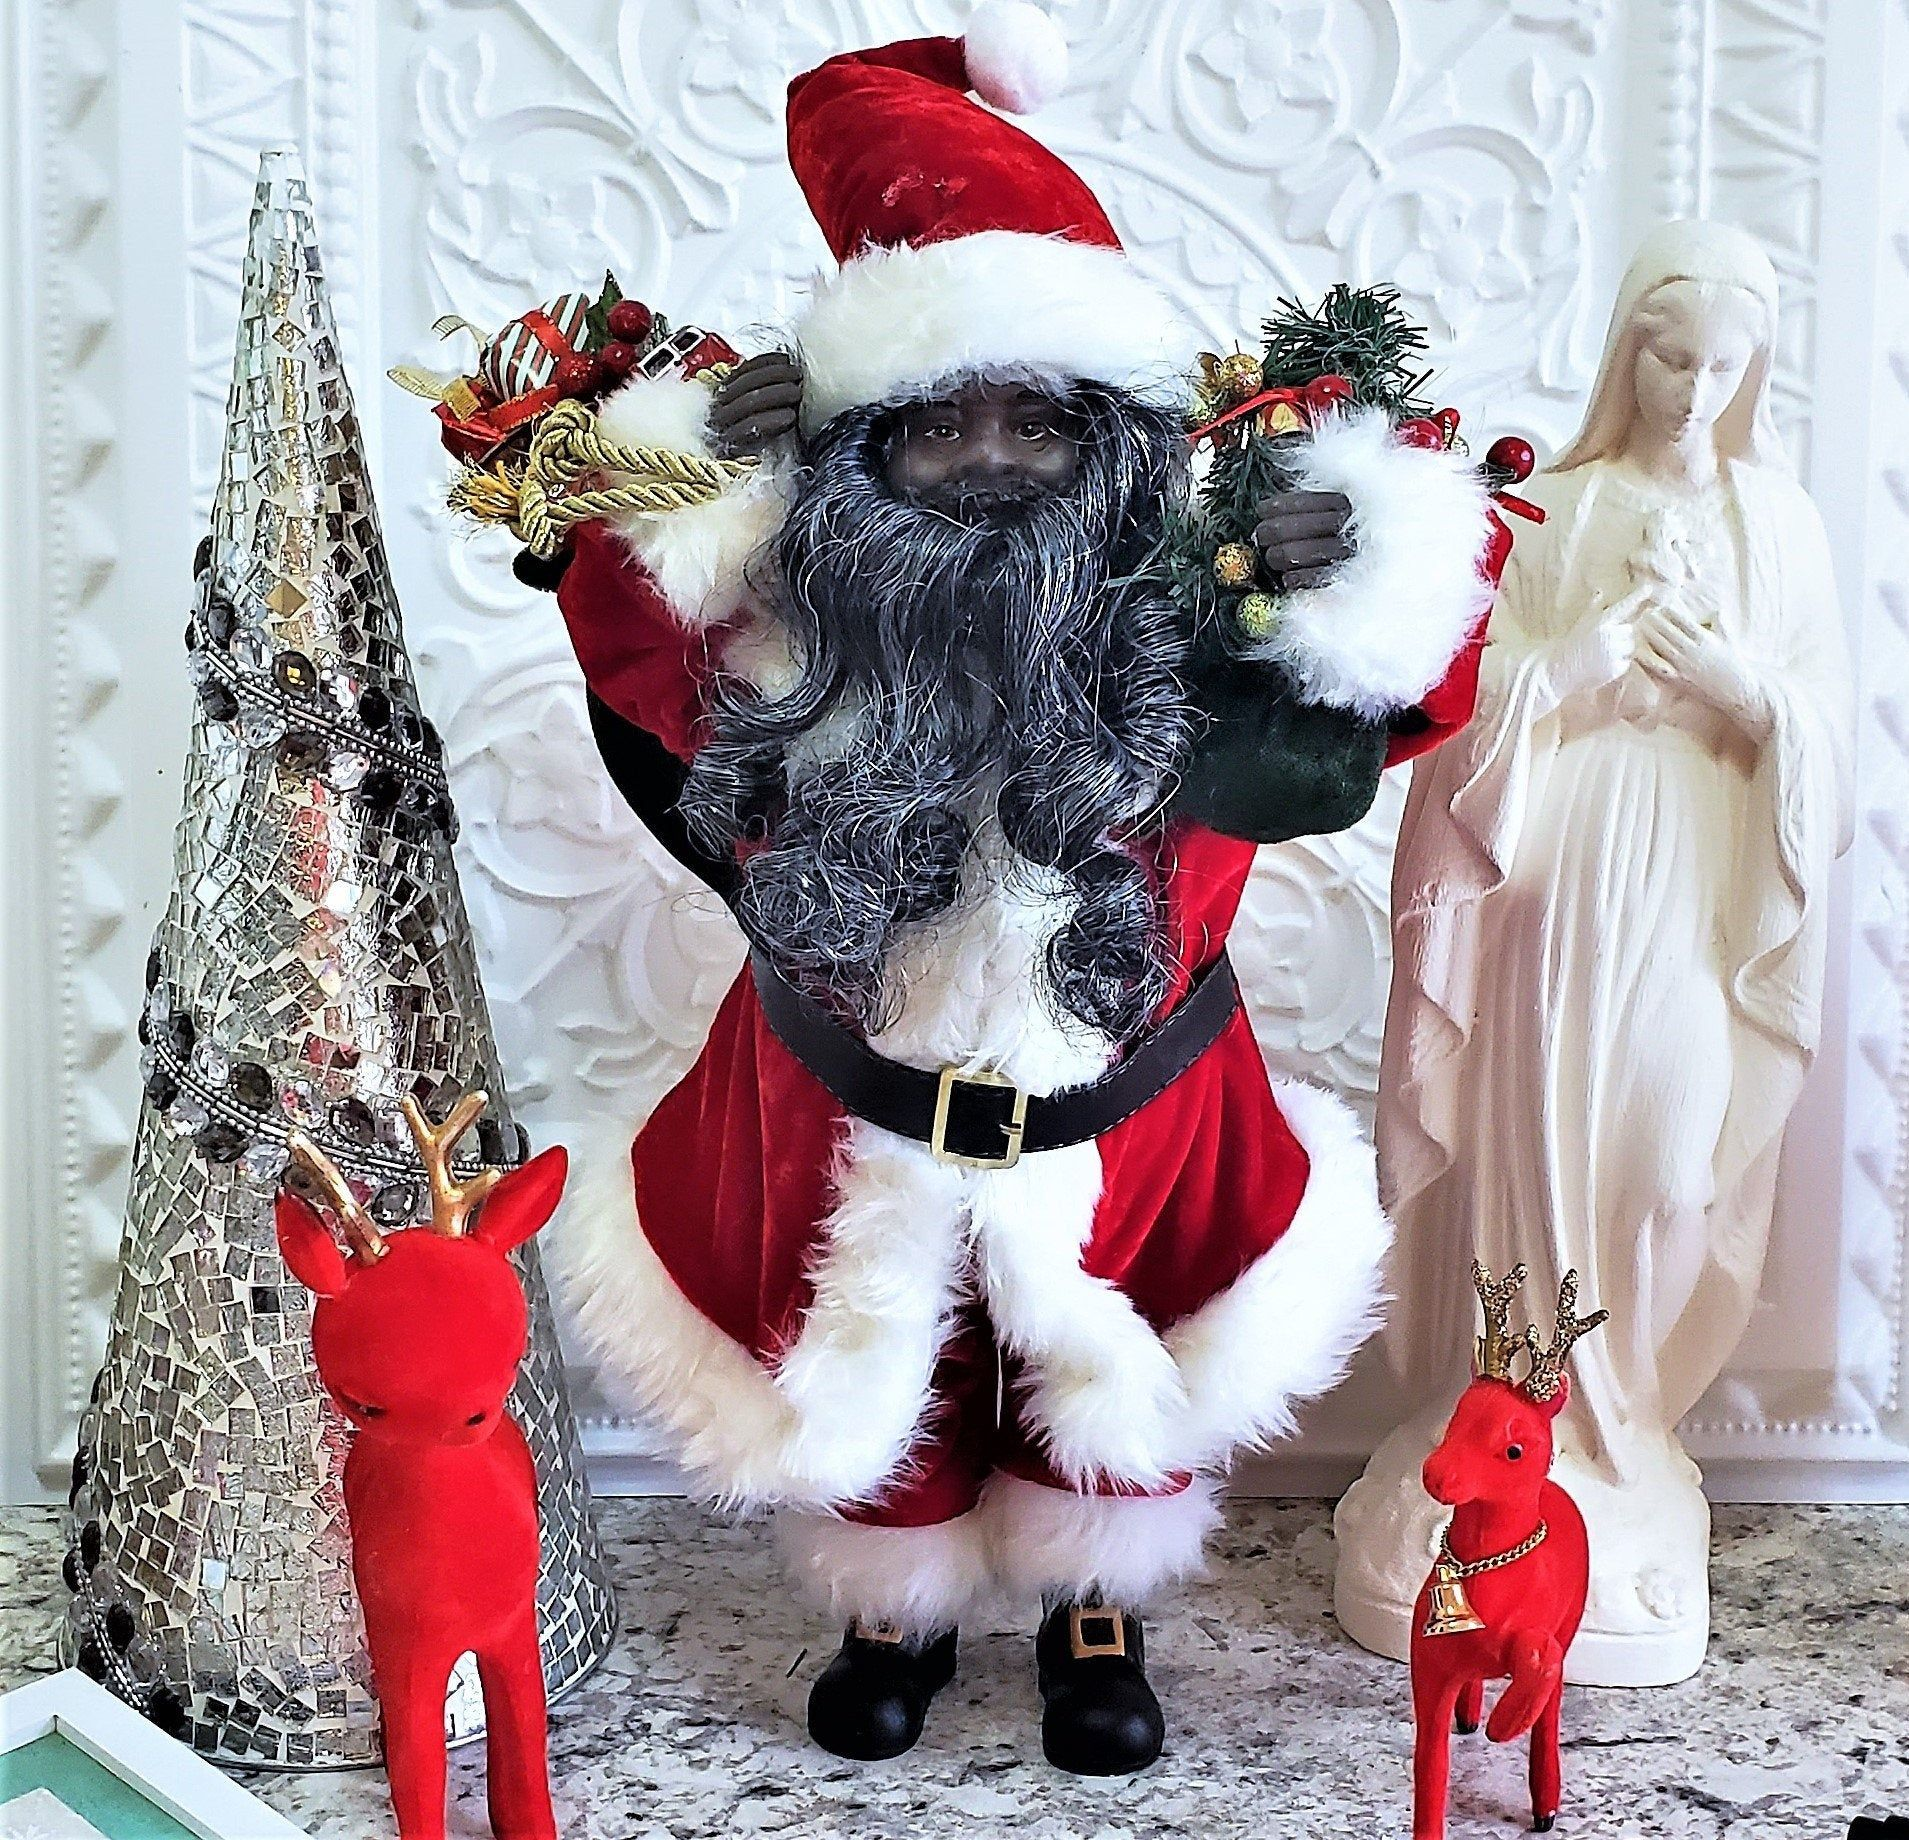 Large Faux Fur Black Santa Claus Christmas Figure Doll Toy Bag 17 5 Little Christmas Trees Christmas Dolls Christmas Snow Globes